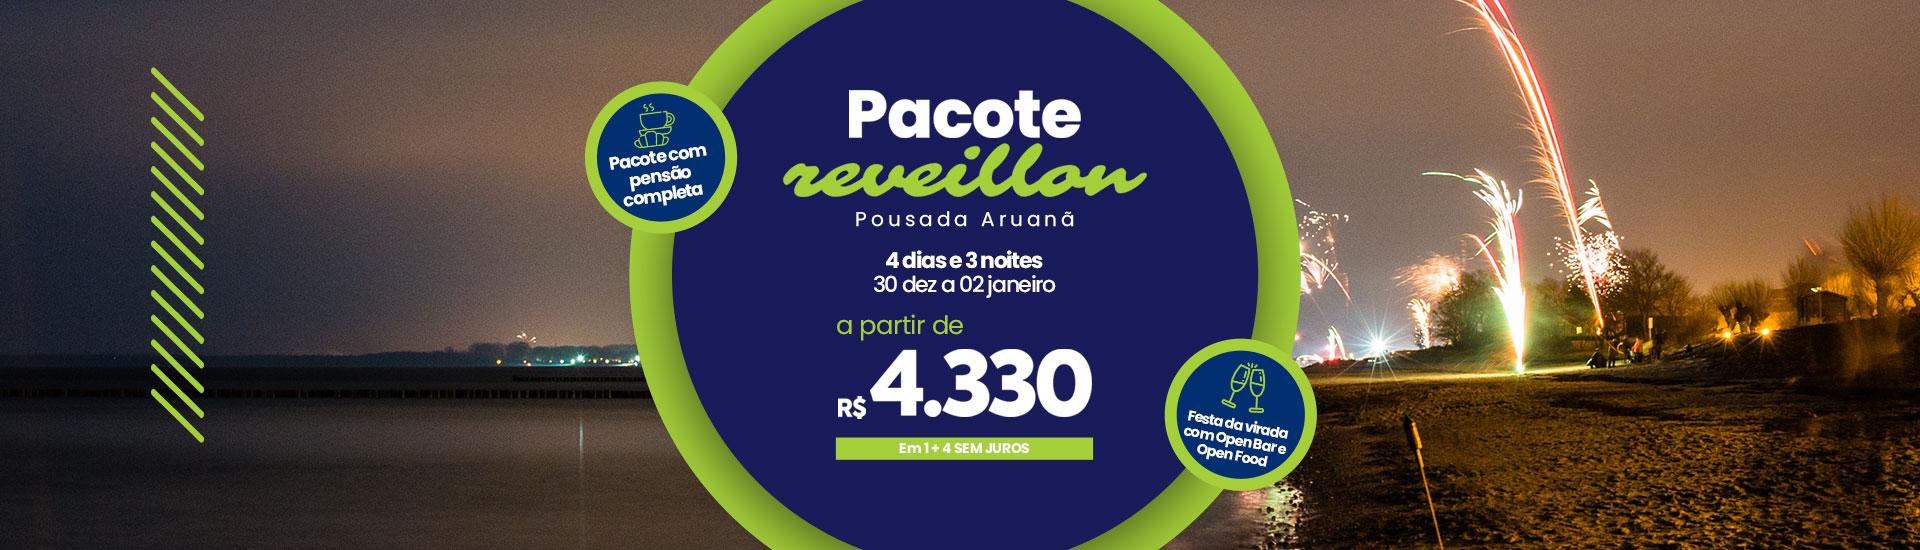 Pacote Reveillon 2021-2022